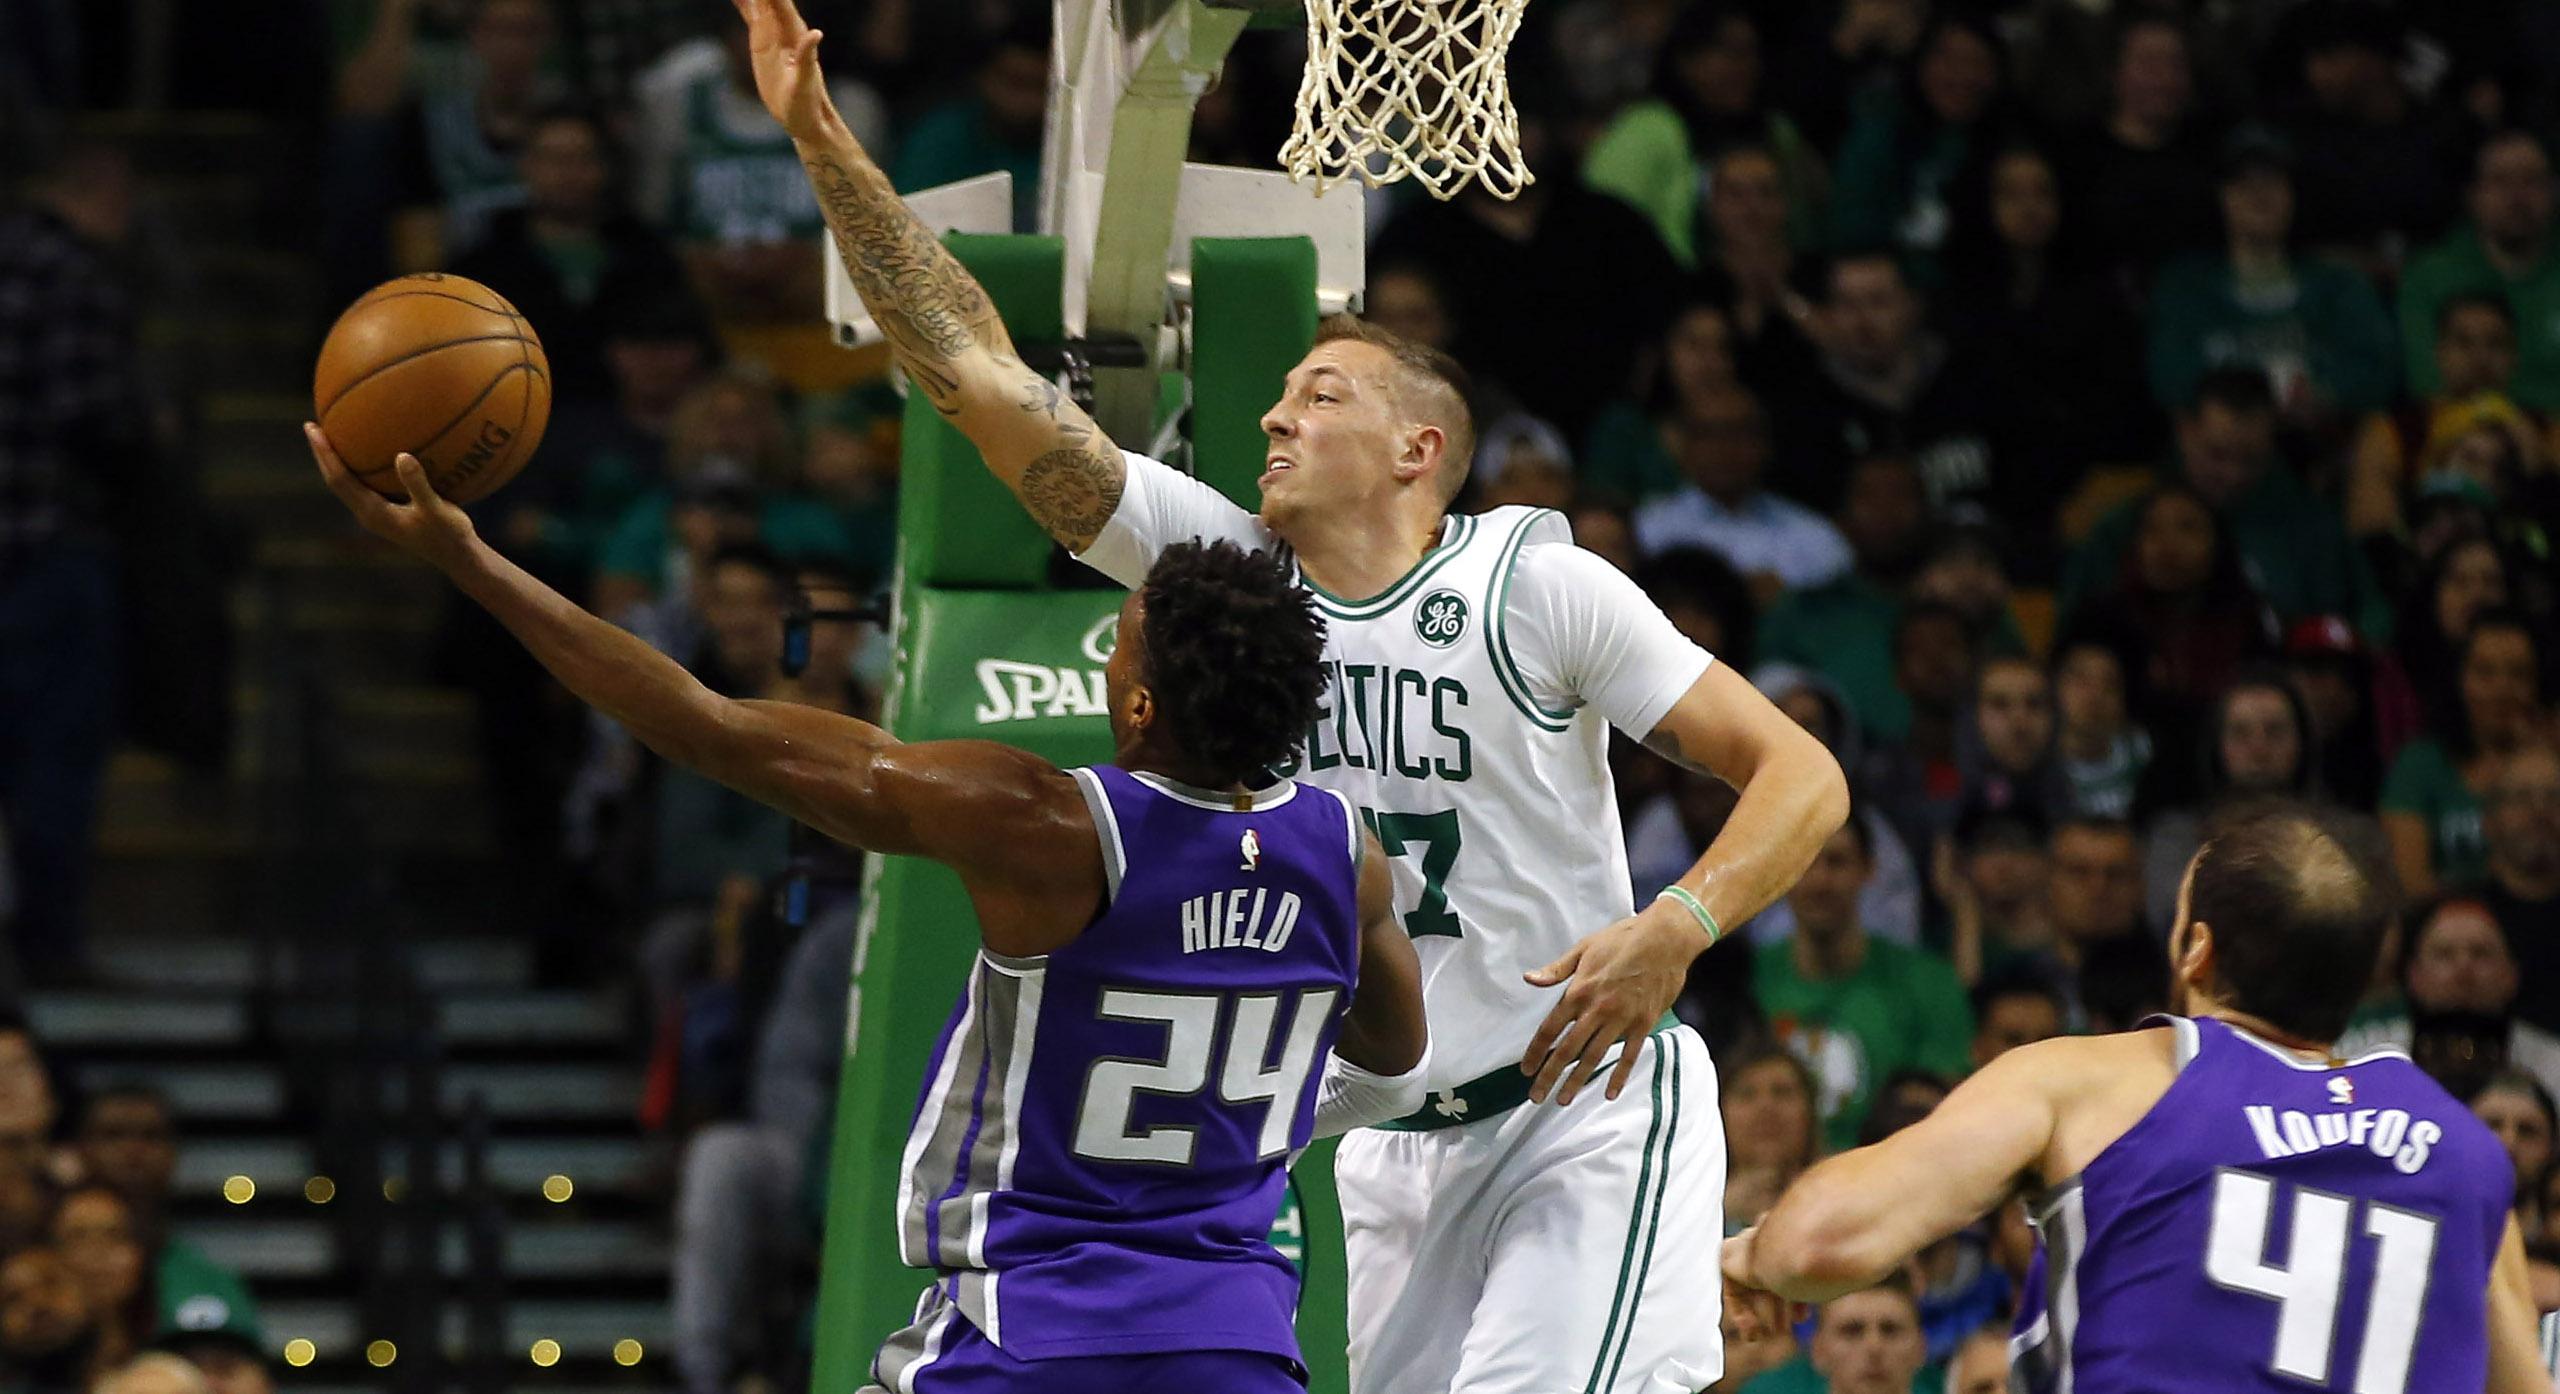 Daniel Theis taponando a Buddy Hield, en un Sacaramento Kings, Boston Celtics, racha